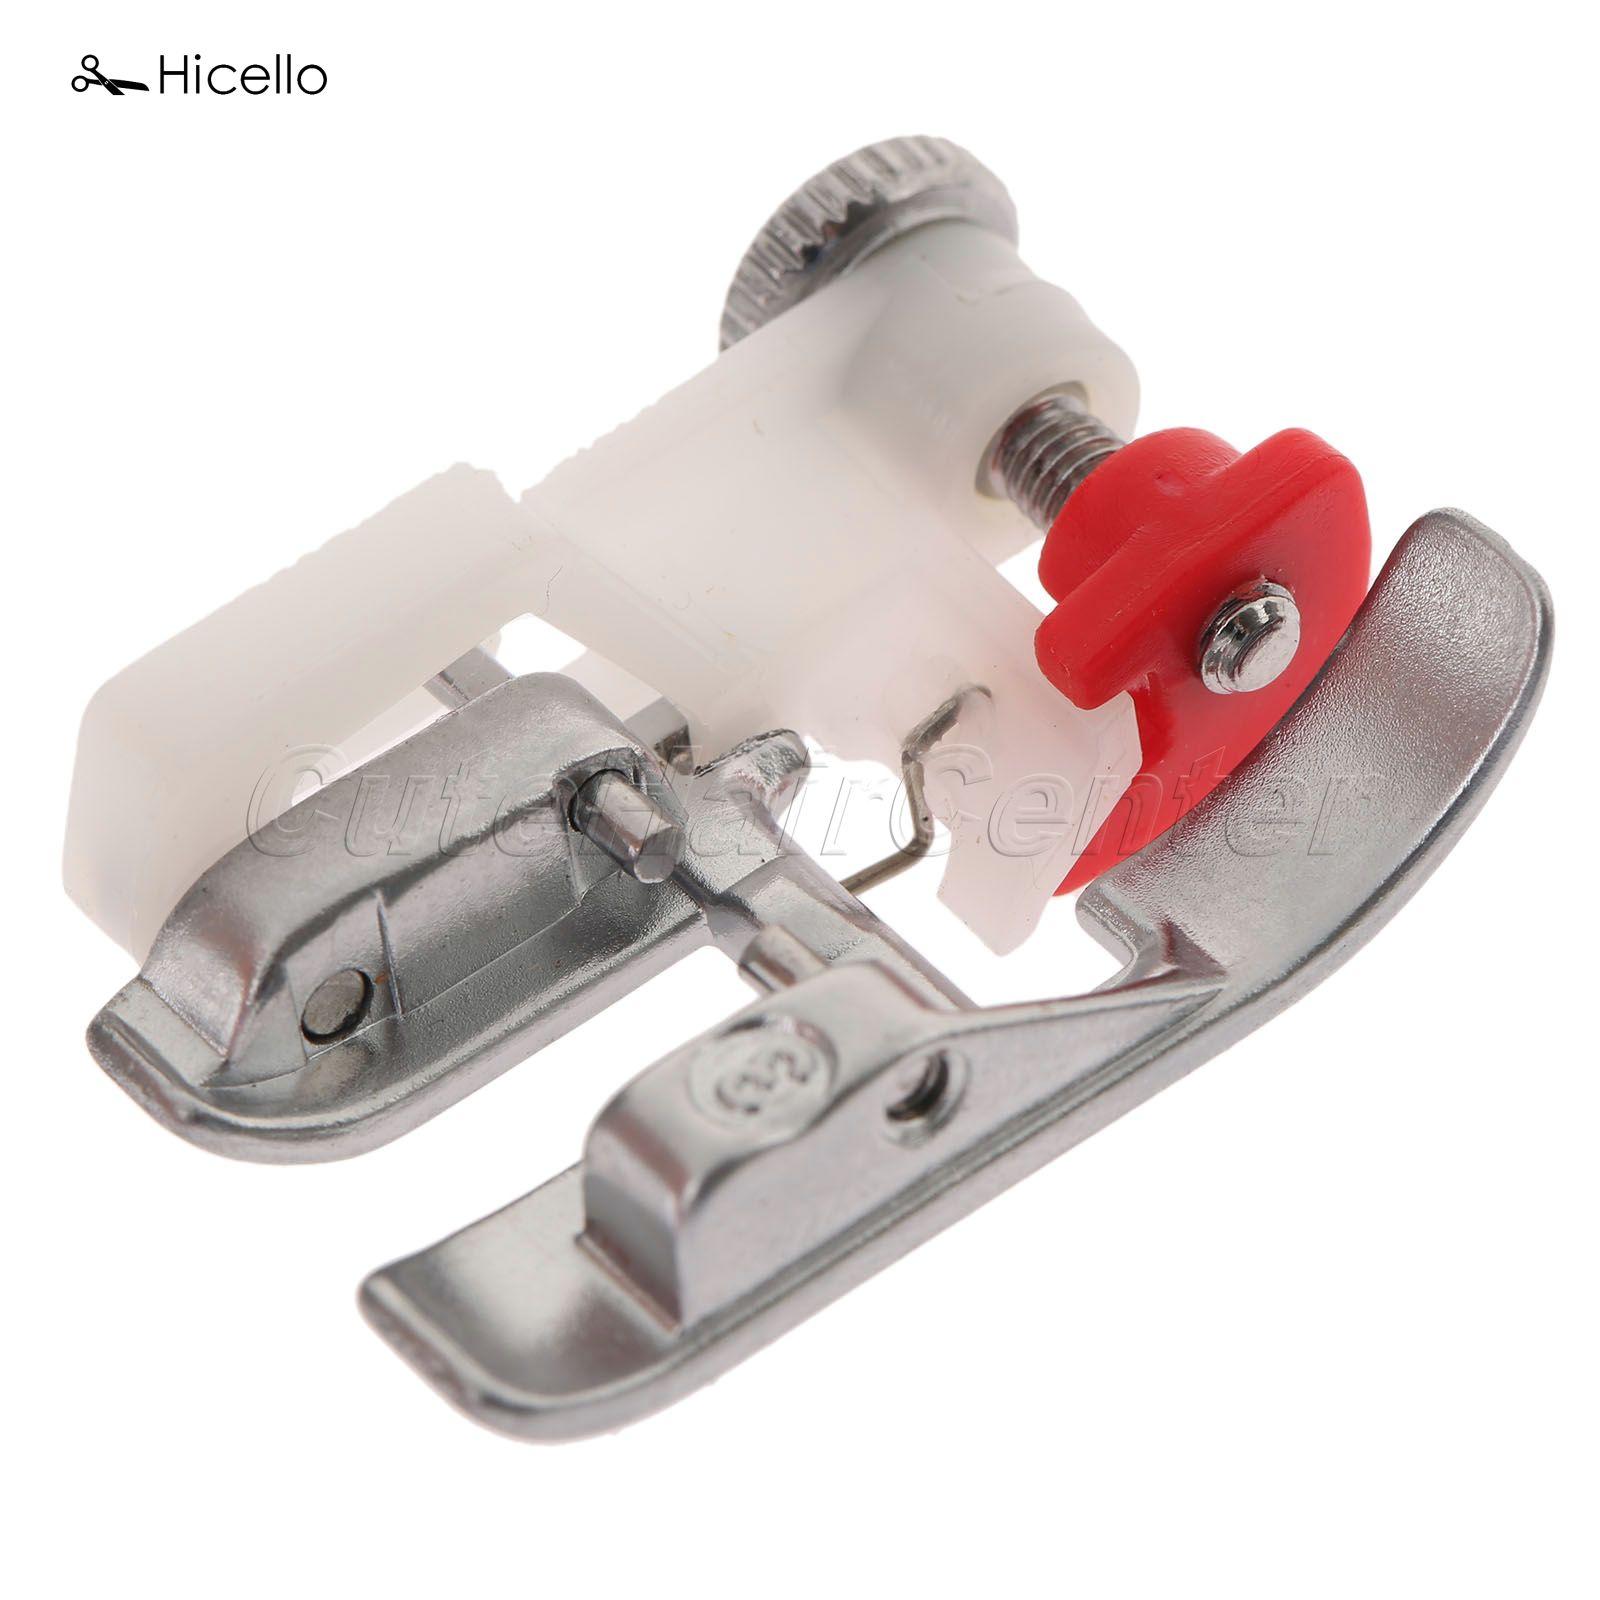 1PC Household Sewing Machine Parts Presser Foot Blindhem Foot (w/ IDT), Pfaff 98-694 890-00 / Blindstitch Presser Foot costura